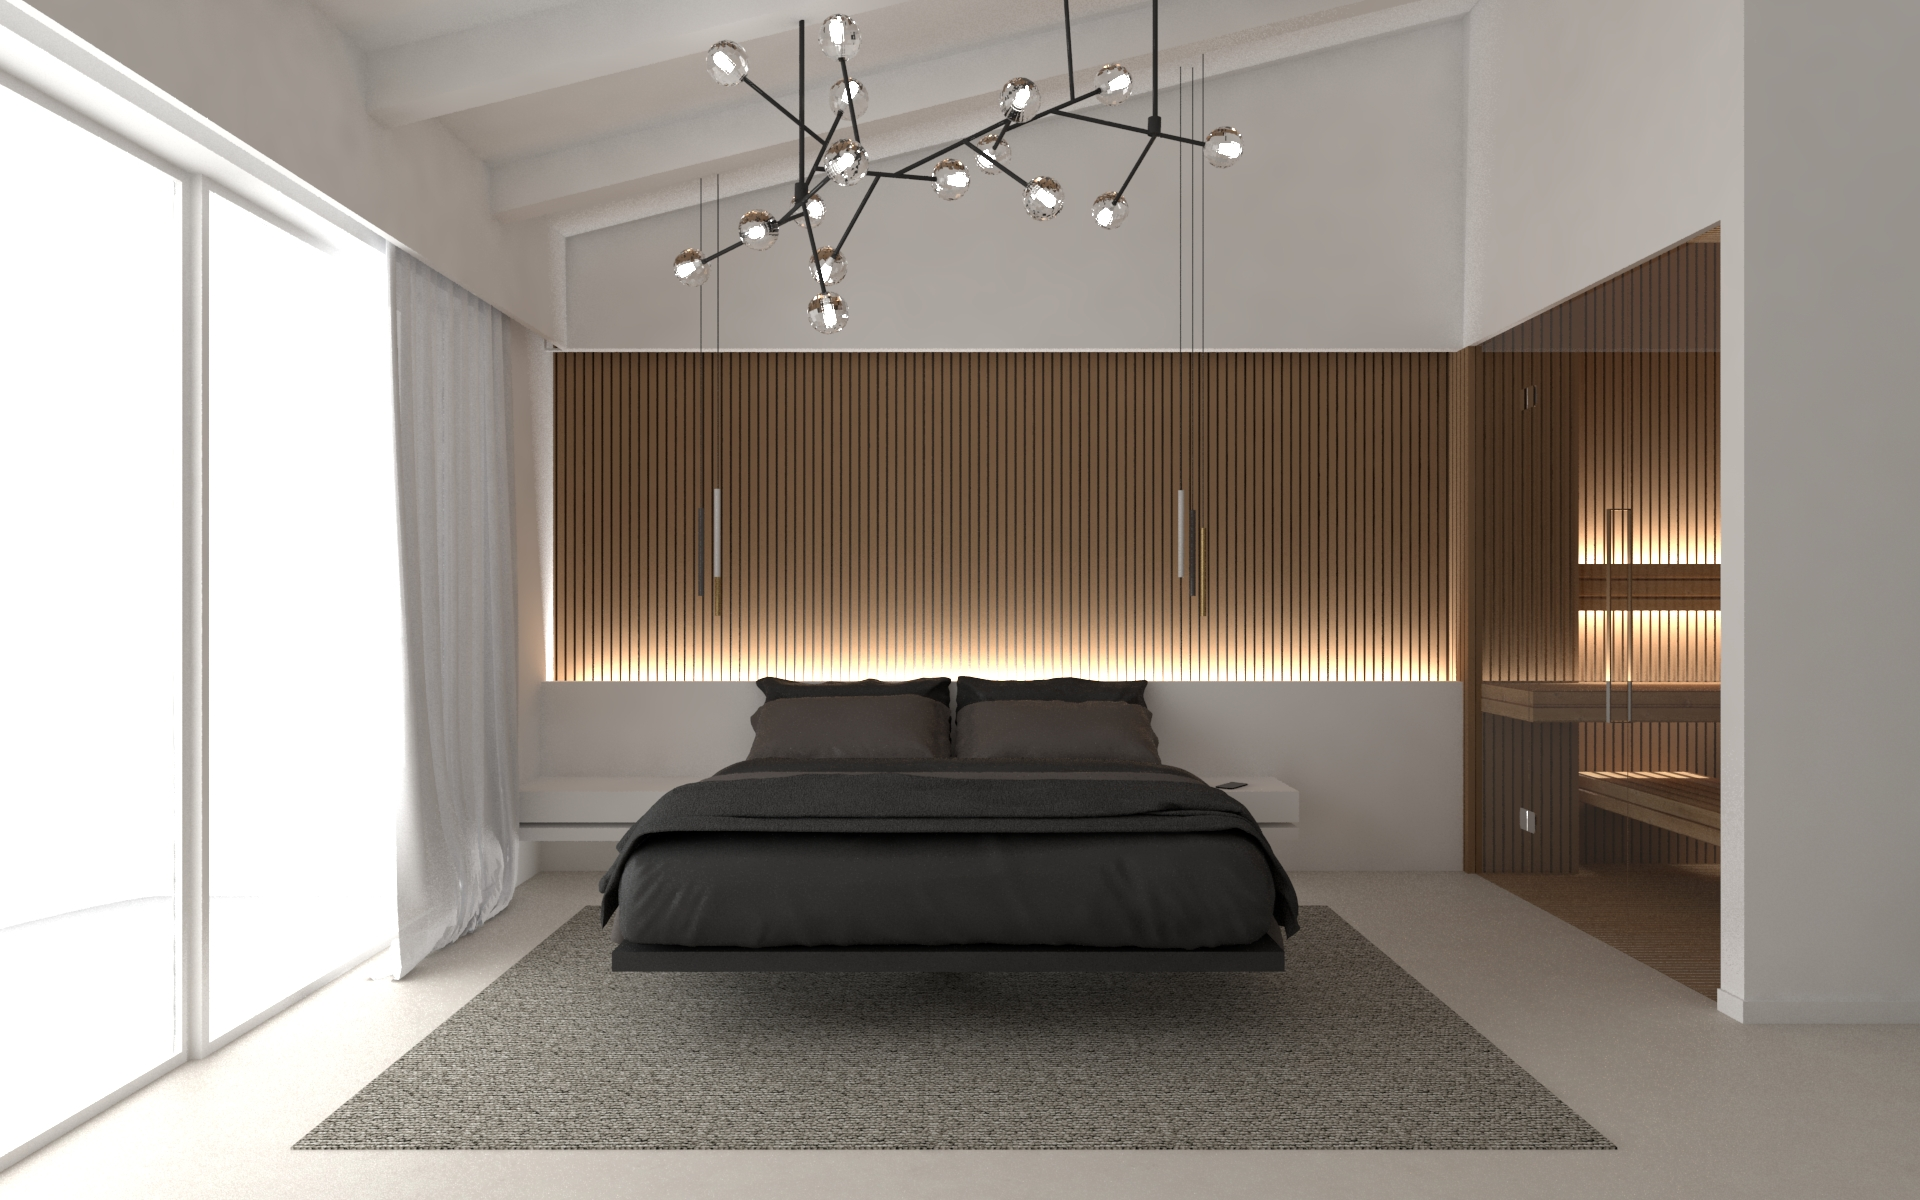 Casa-MR-_-DFG-Architetti-Associati-4